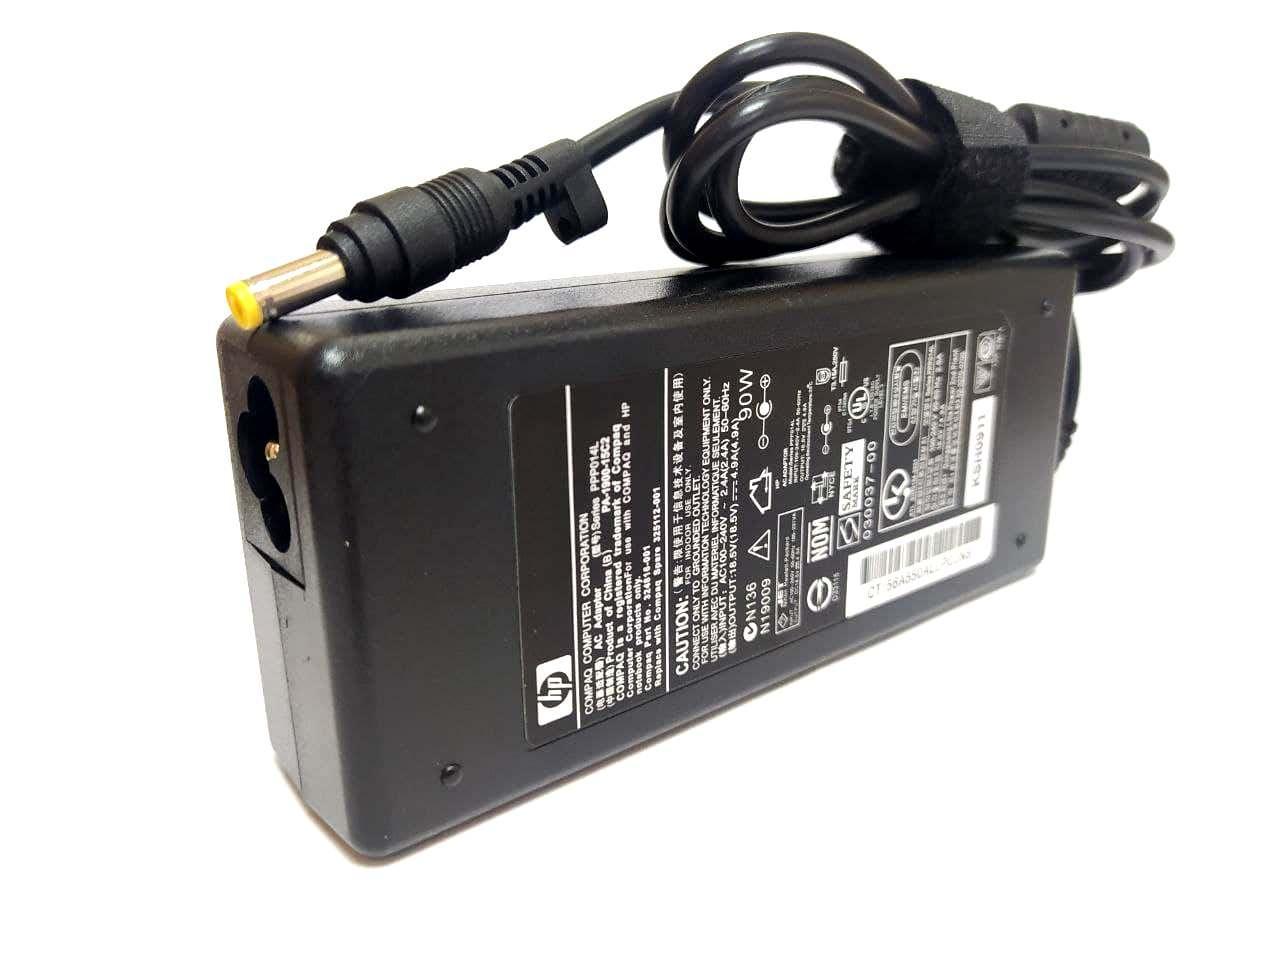 Блок питания для ноутбука HP Pavilion DV8400 Series 18.5V 4.9A 4.8*1.7mm 90W